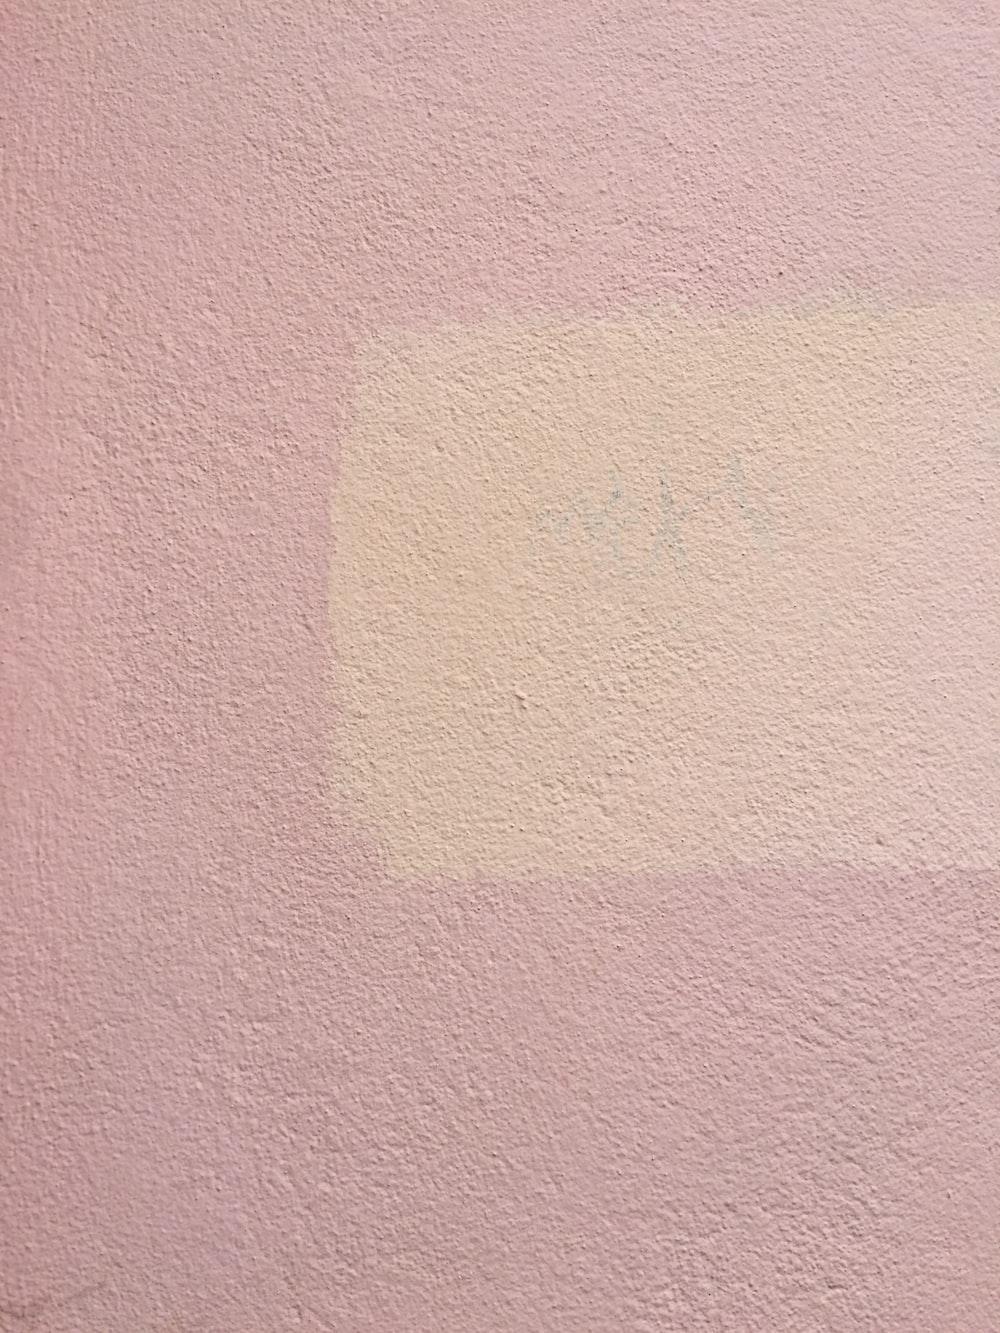 pink concrete surface